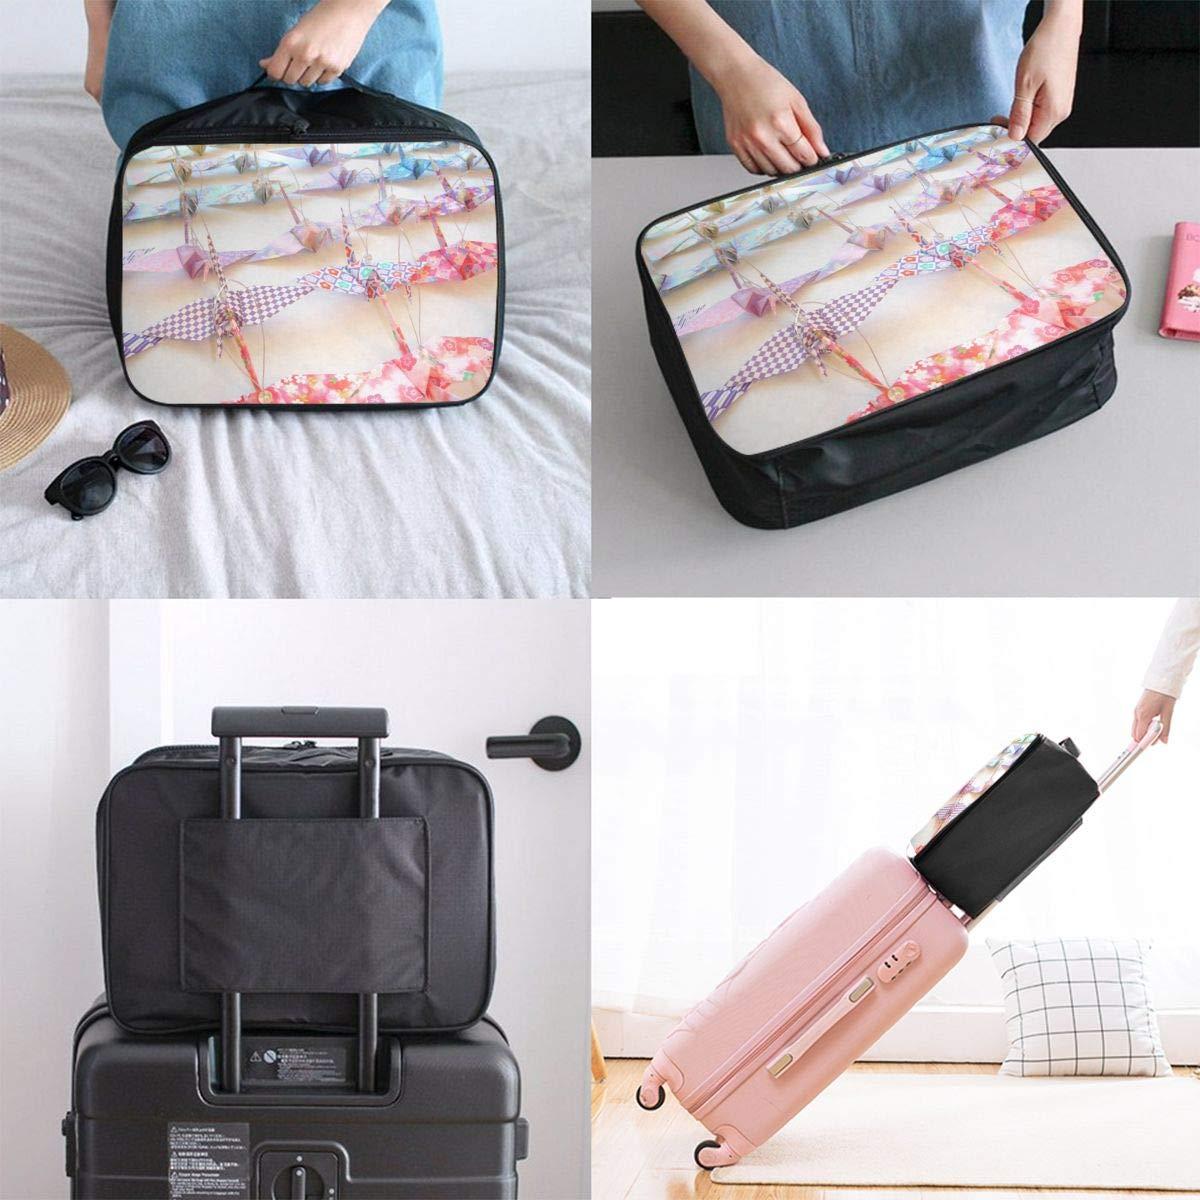 Travel Luggage Duffle Bag Lightweight Portable Handbag Colorful Origami Cranes Pattern Large Capacity Waterproof Foldable Storage Tote